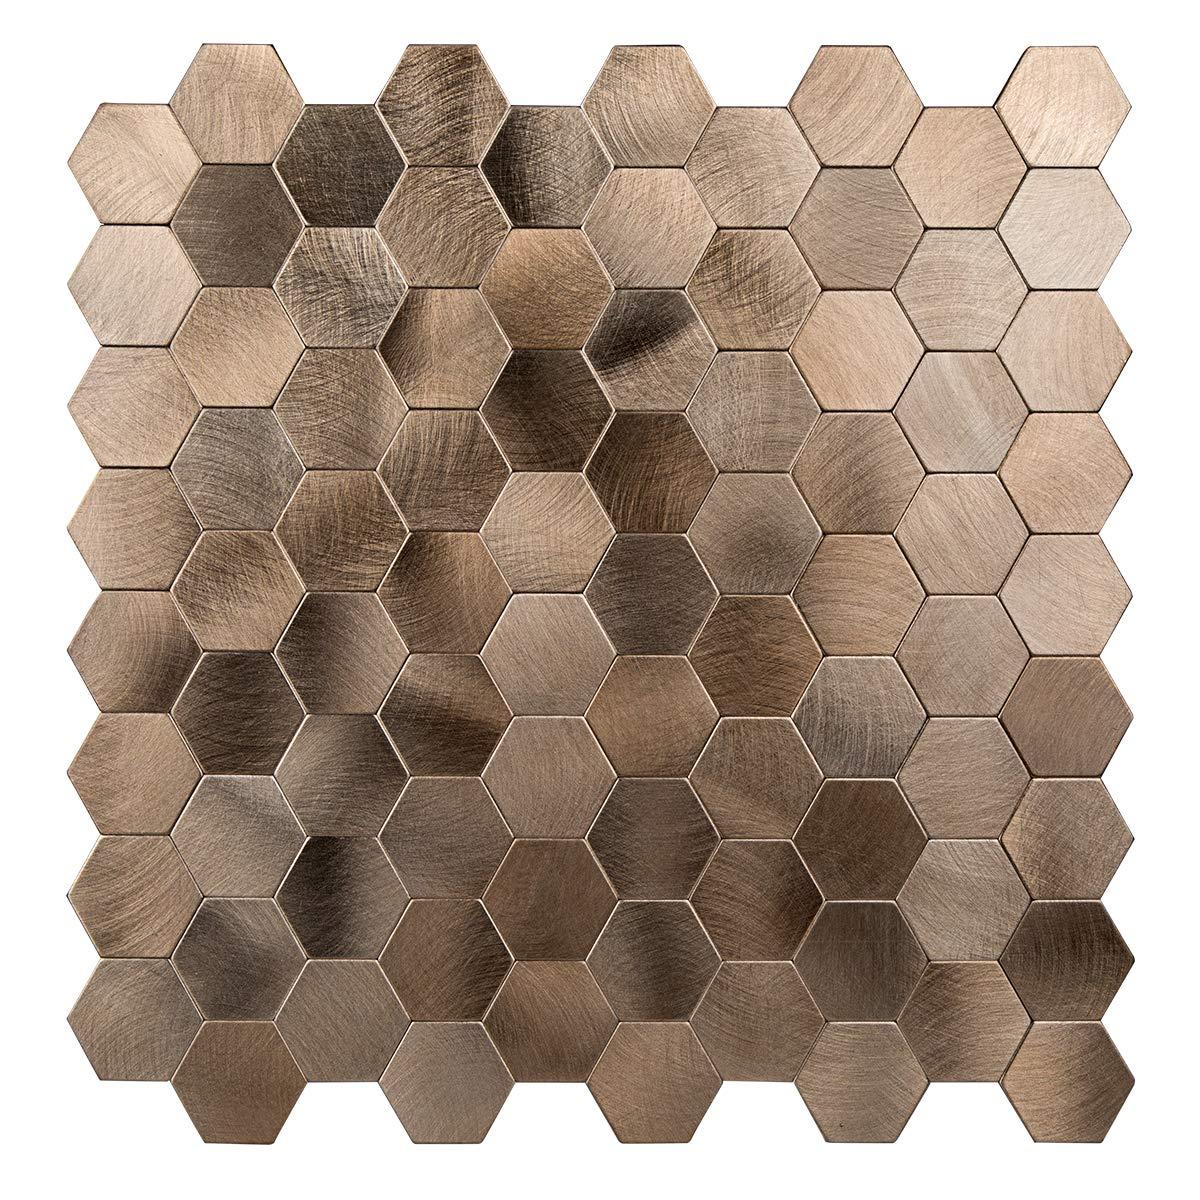 Decopus Peel and Stick Tile Backsplash (Honeycomb- Goldish Copper) Stick on Metal Wall Tiles for Kitchen, Bathroom, Cabinet Doors, Accent Walls, 5pack